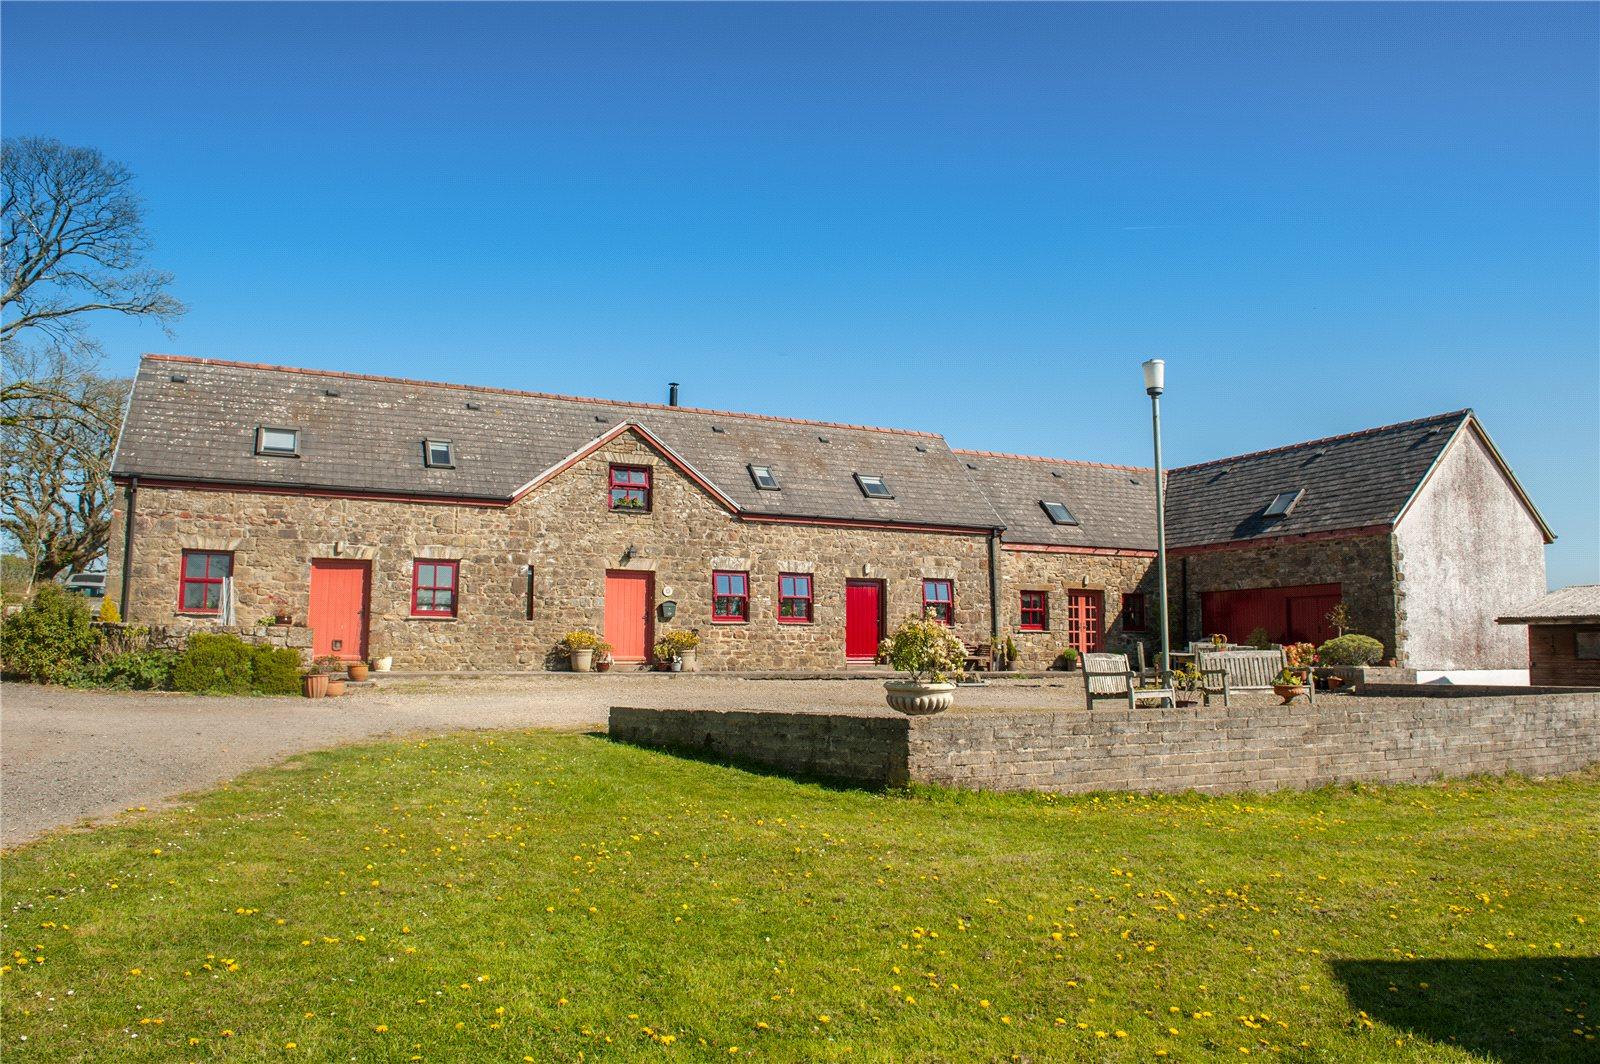 6 Bedrooms Detached House for sale in Upper Glanrhyd, Llanddewi Velfrey, Narberth, Pembrokeshire